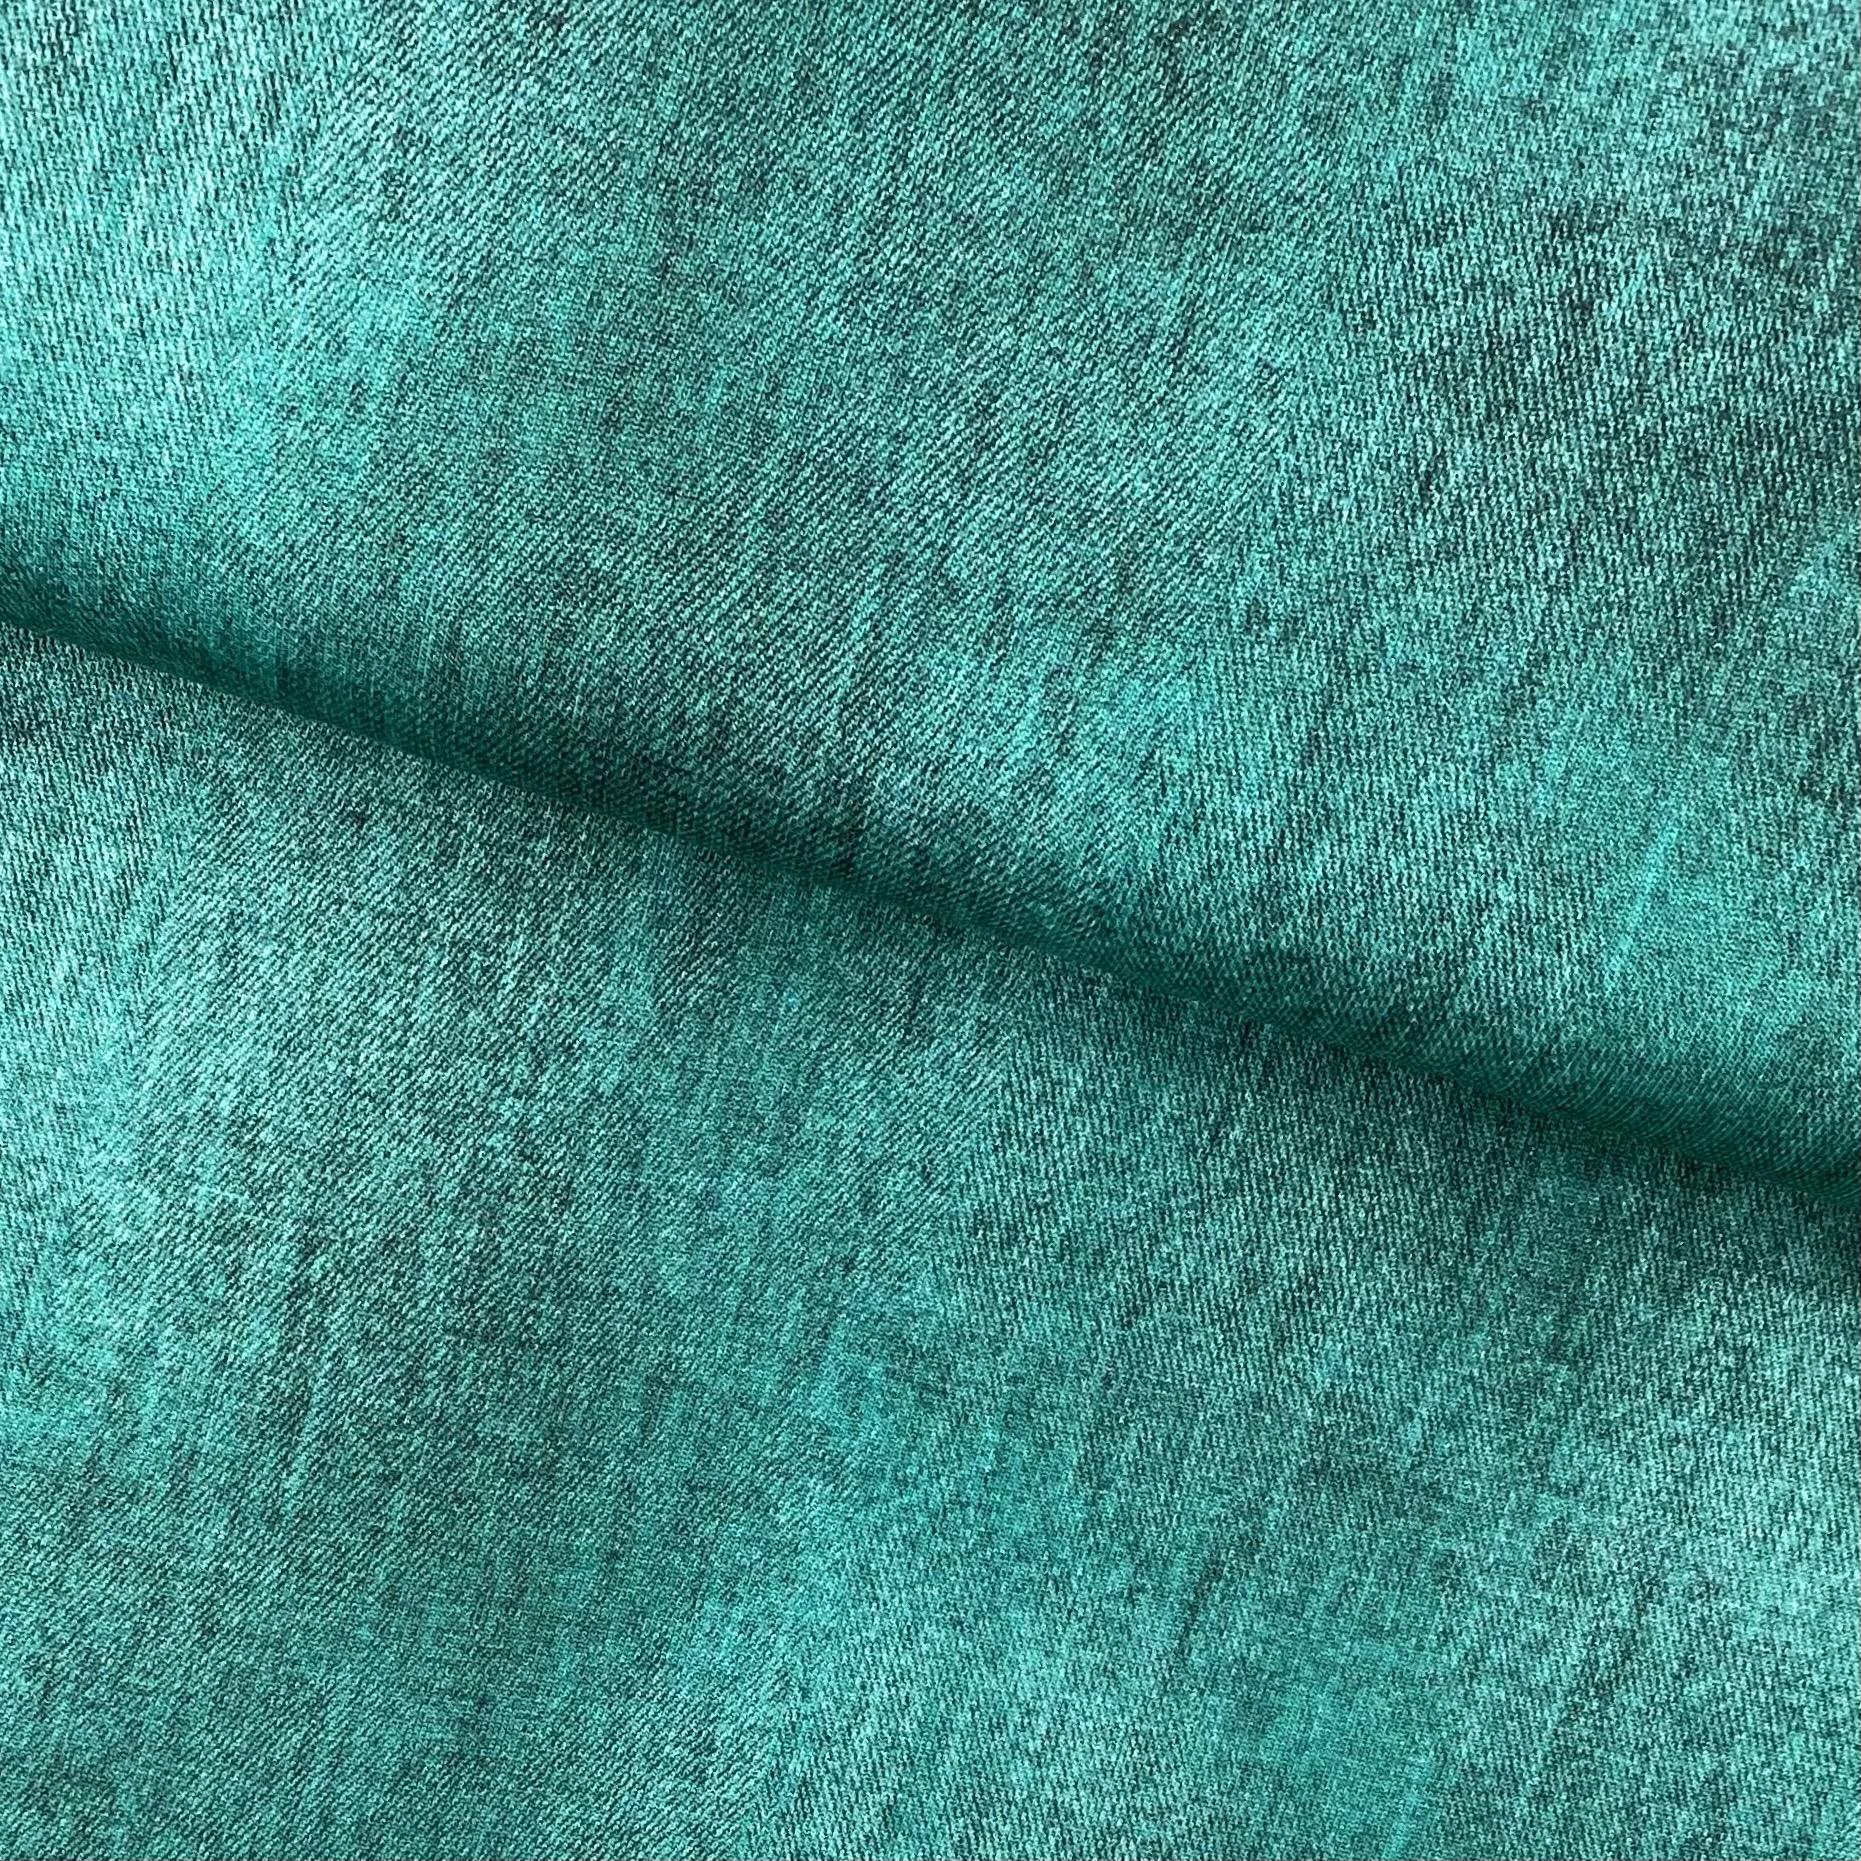 Baumwolljersey, Batik Druck, grün. Art. 14511/024